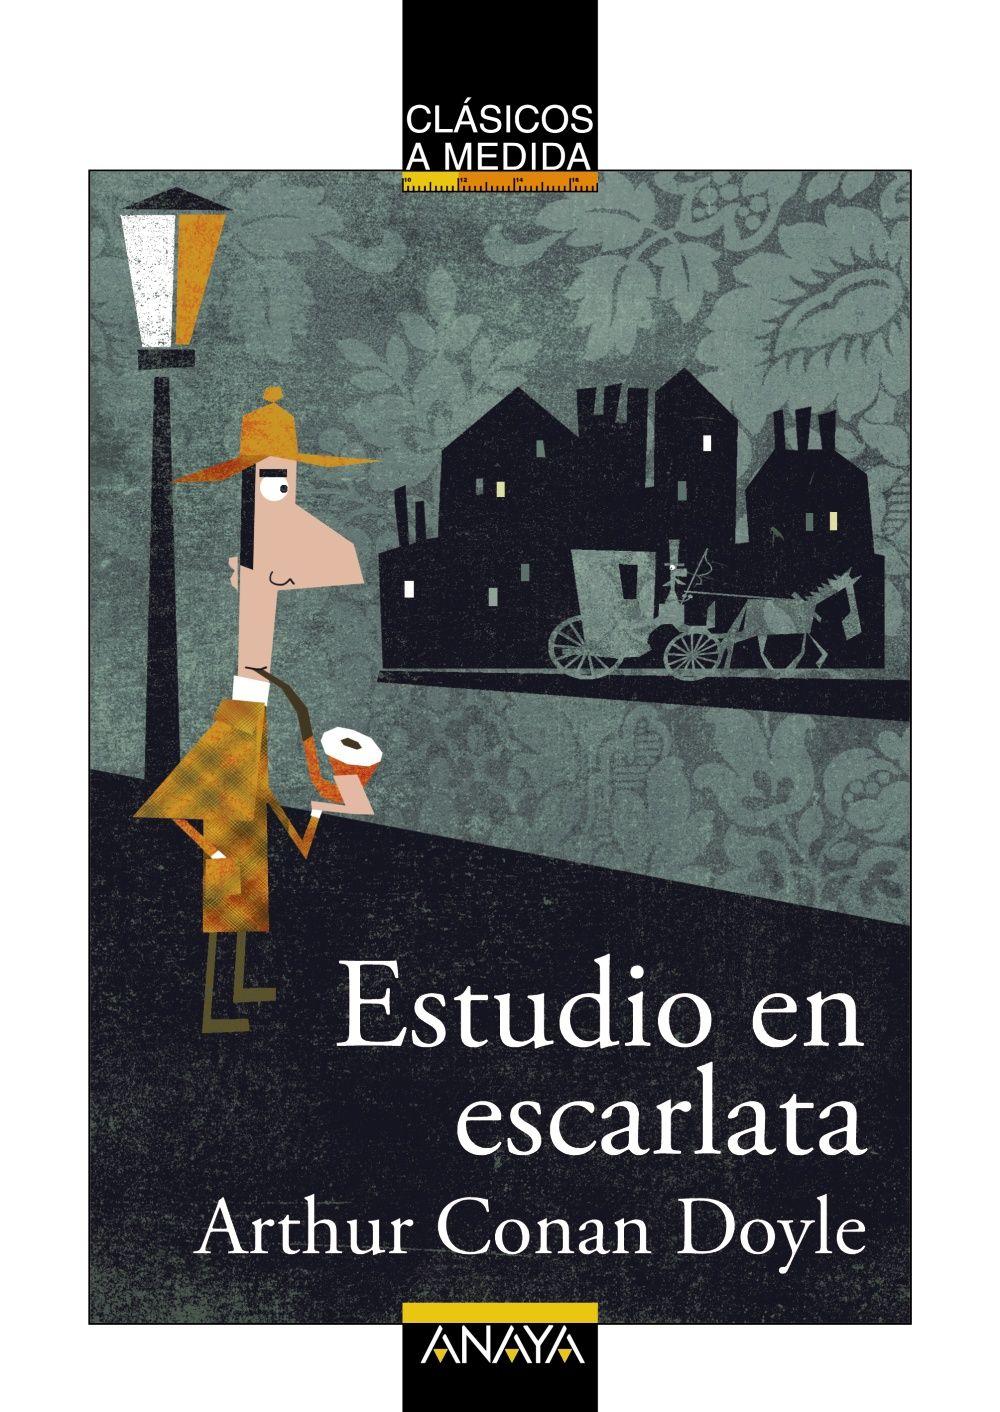 Pin De Beatriz Paradiñeiro En Para Jóvenes Youngpeople Teenagers Novelas De Suspenso Libros Novelas Policiacas